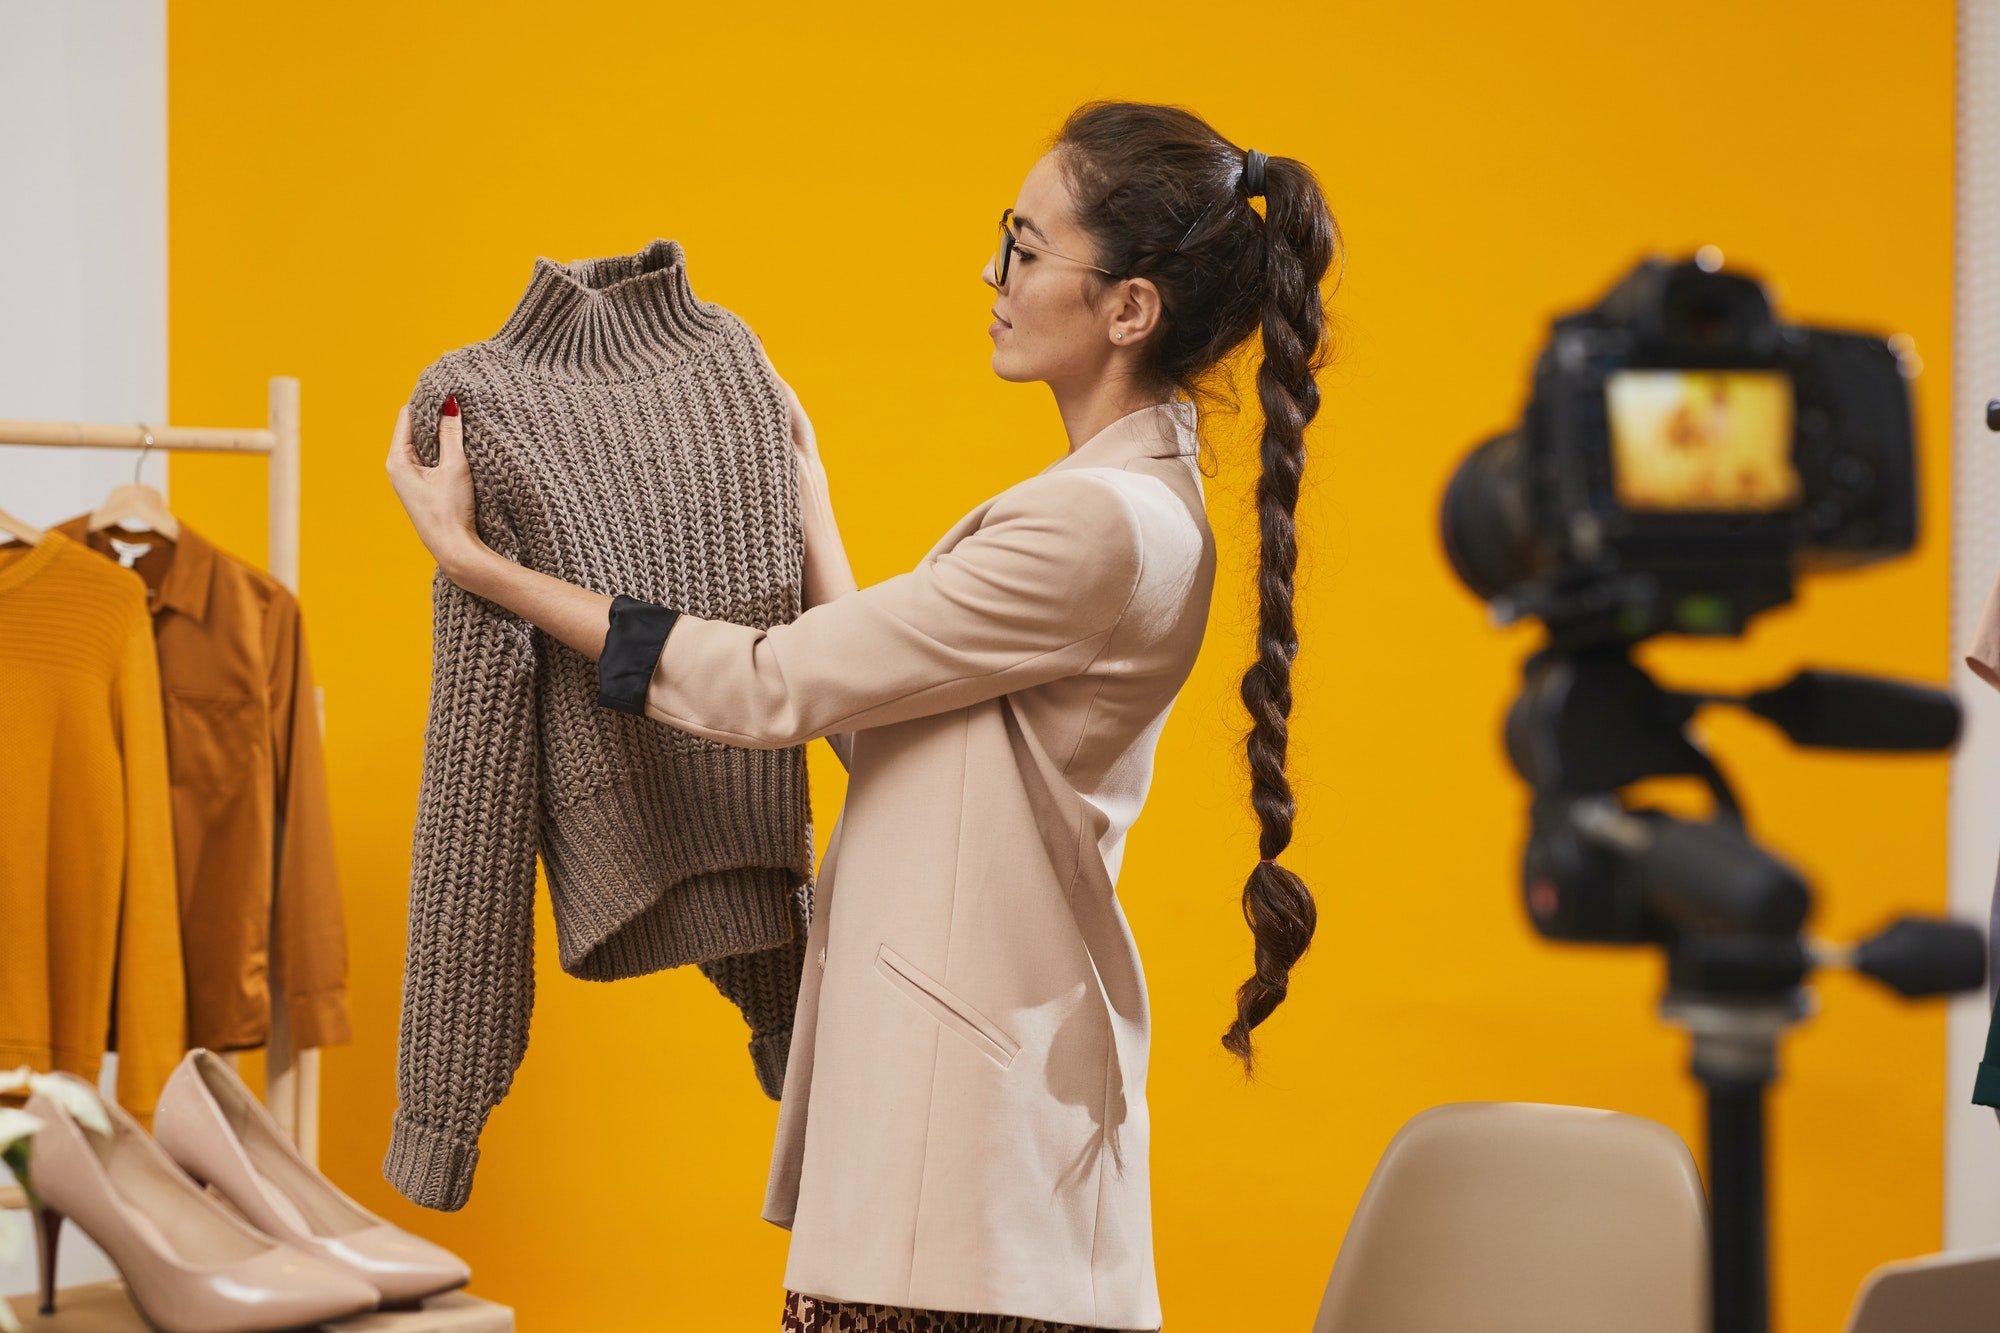 Fashion Vlogger Filming Video